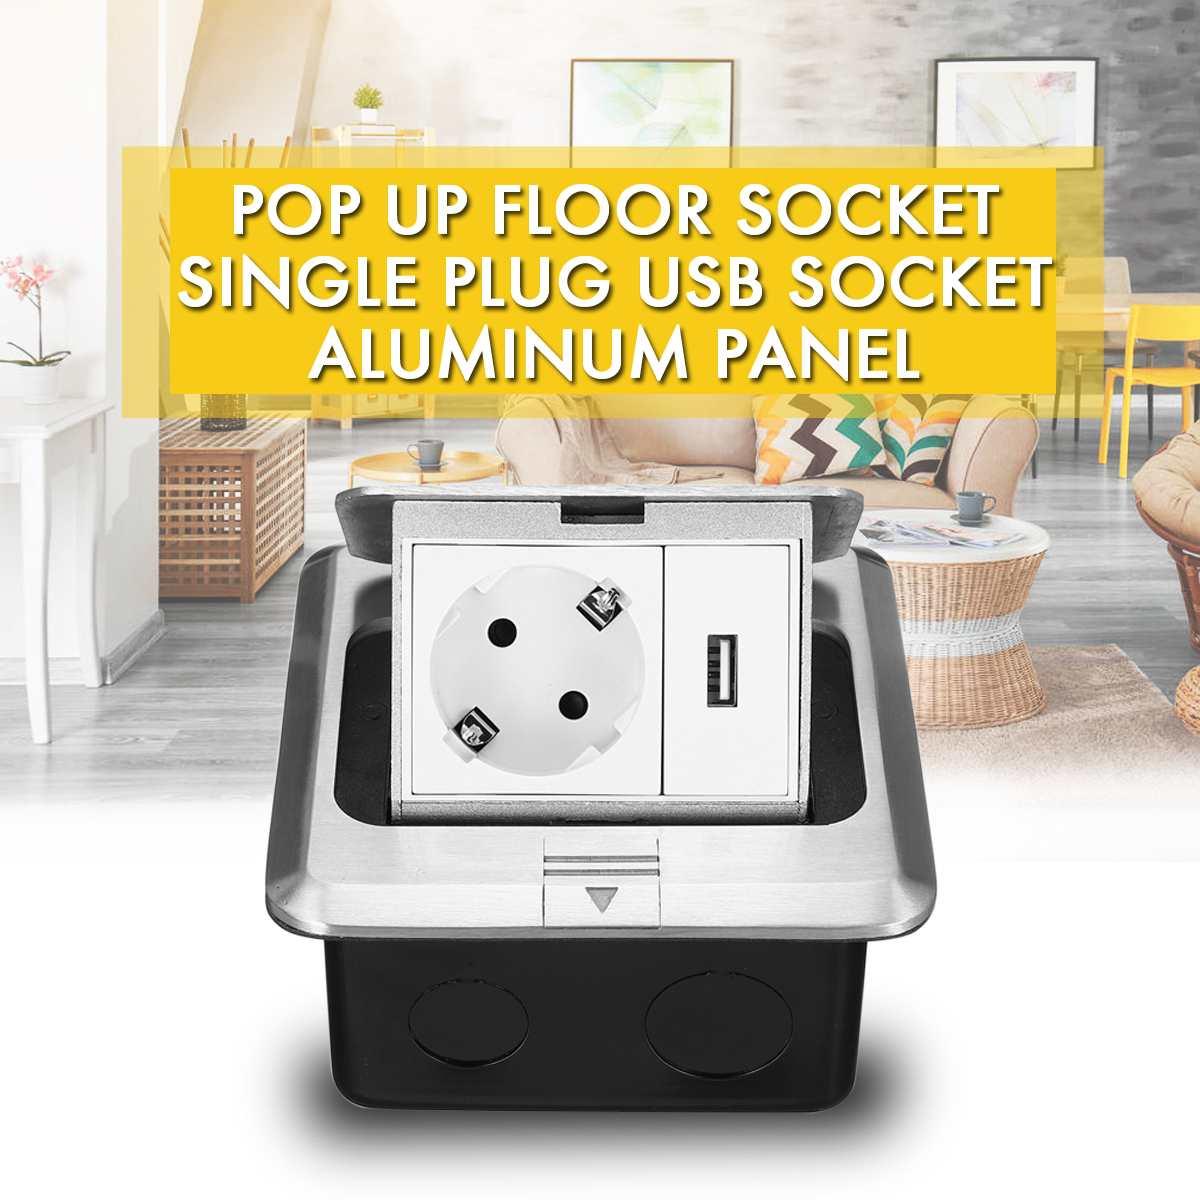 Tüm alüminyum gümüş Panel Pop-Up zemin soket 16A rusya İspanya ab standart güç çıkışı USB şarj portu 5V 1A